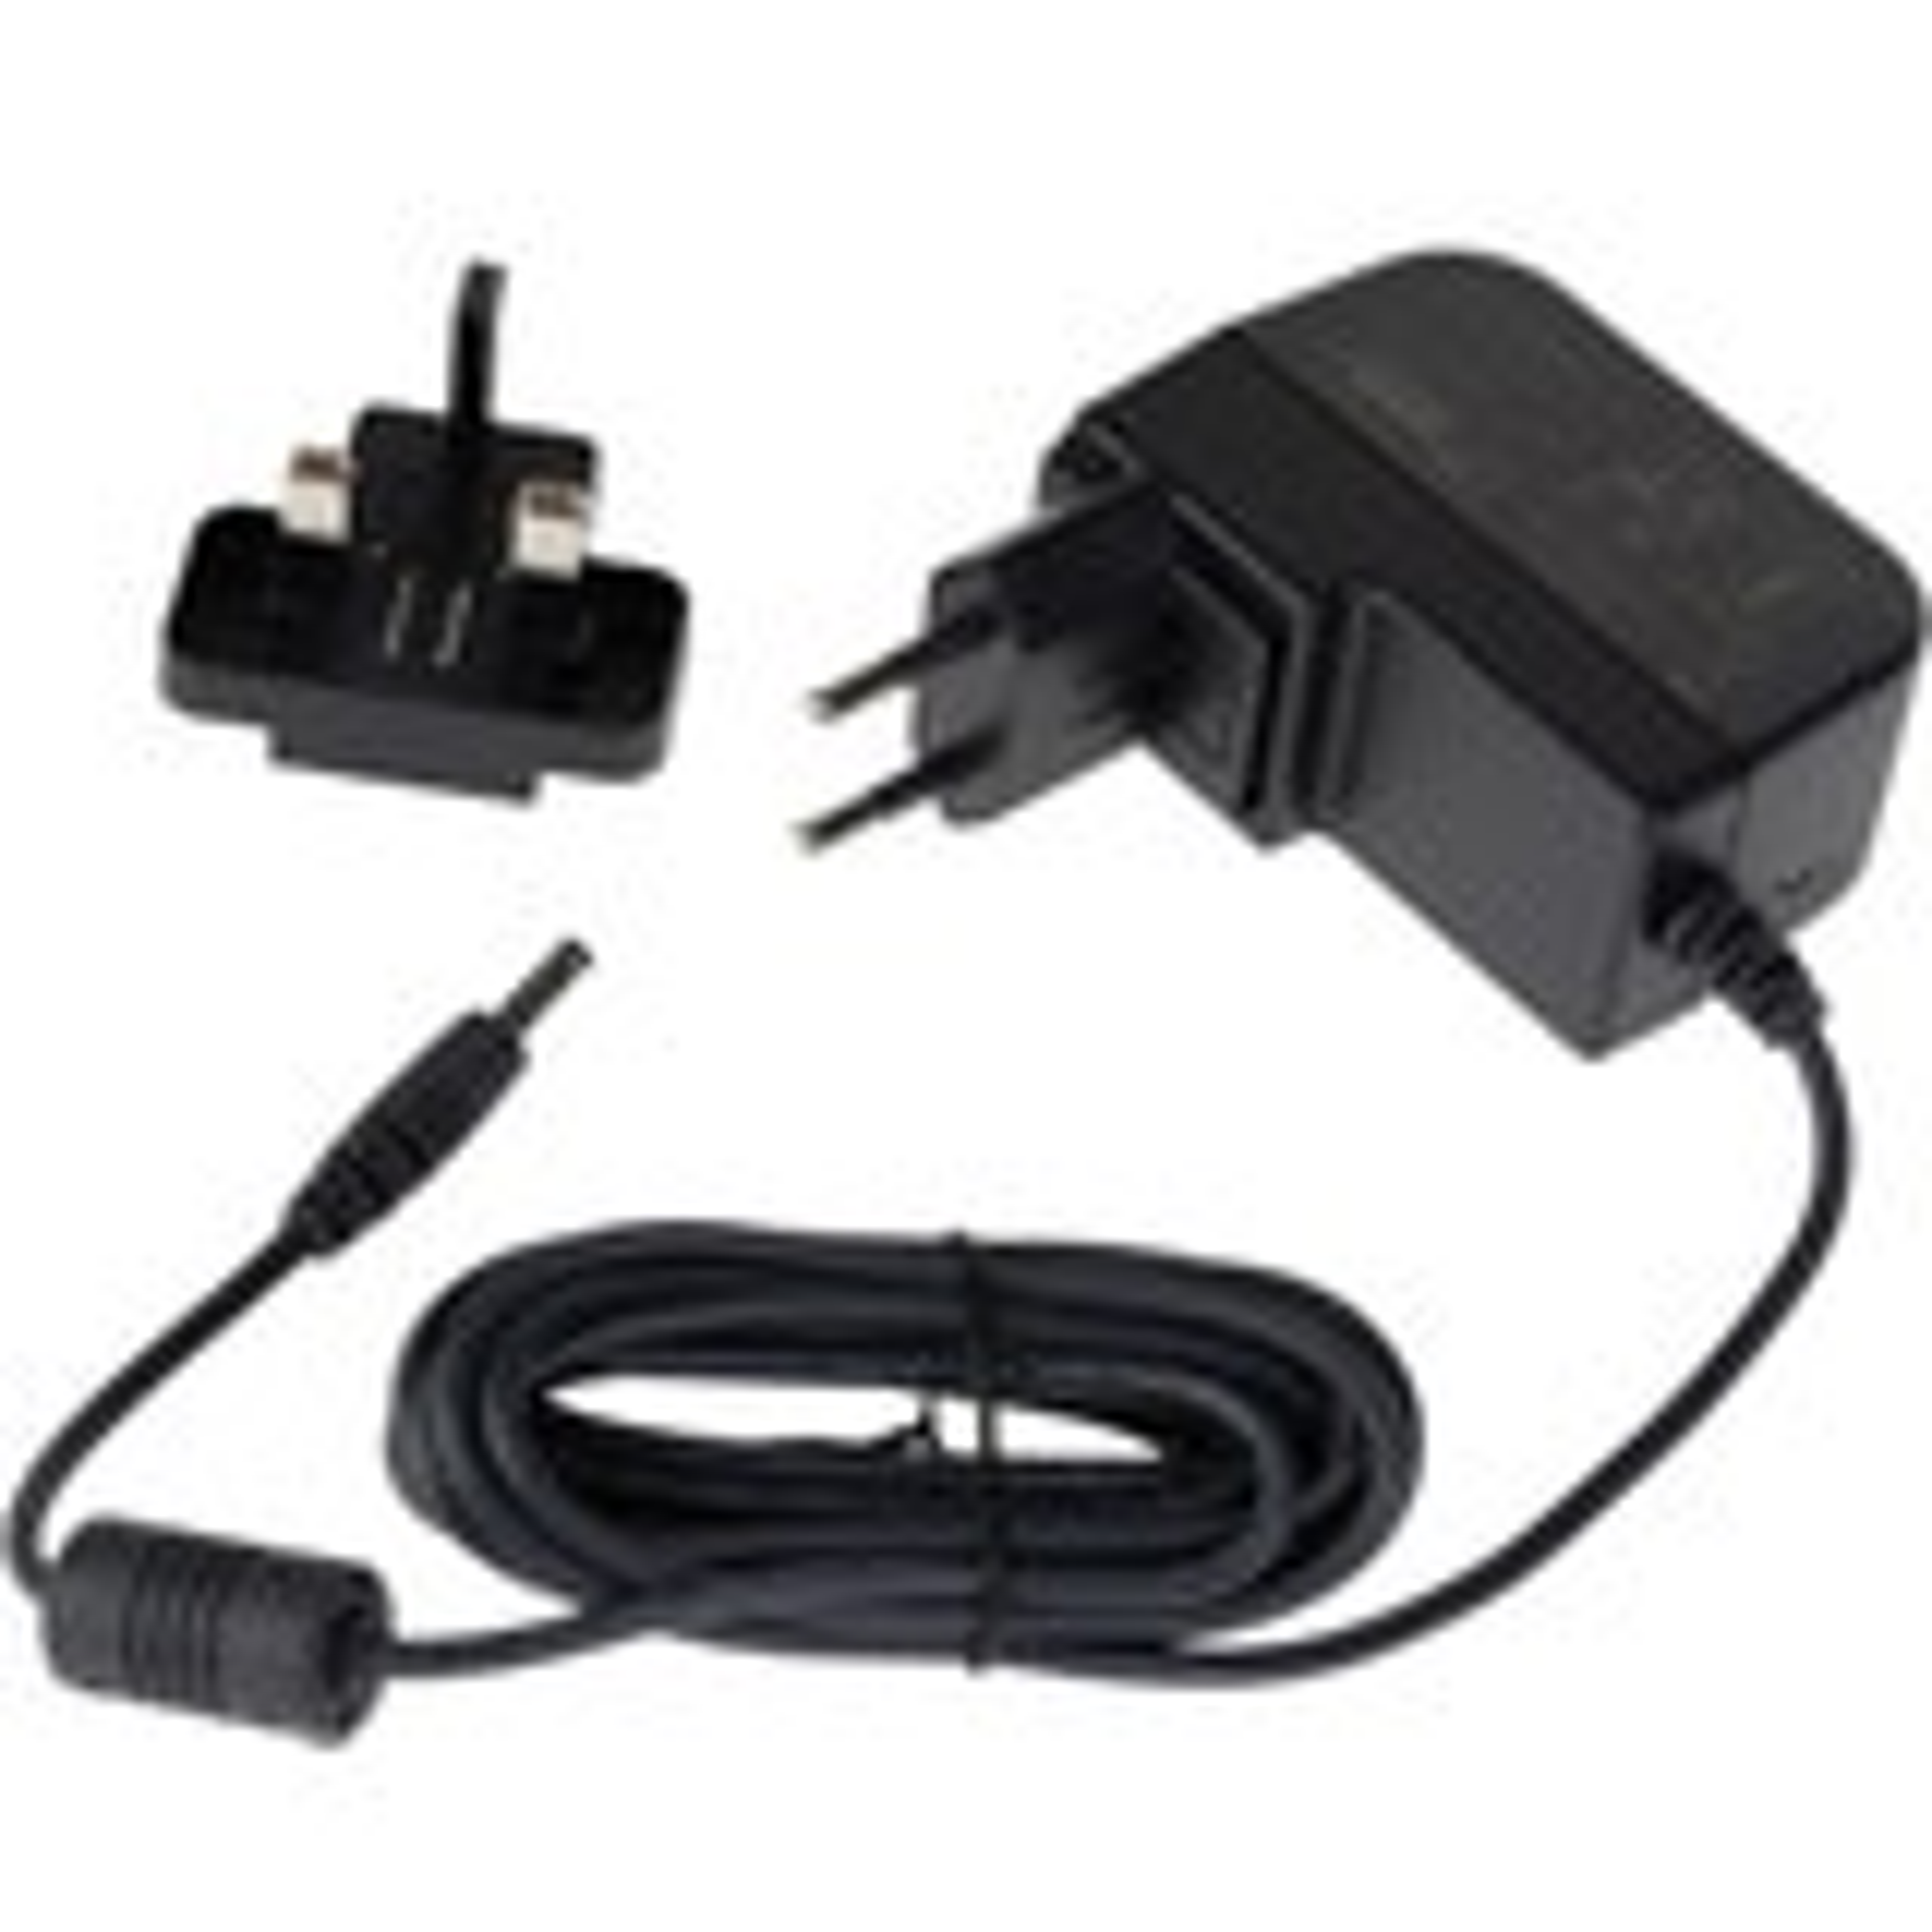 Logitech Power Adapter EMEA Plug for Rally Camera